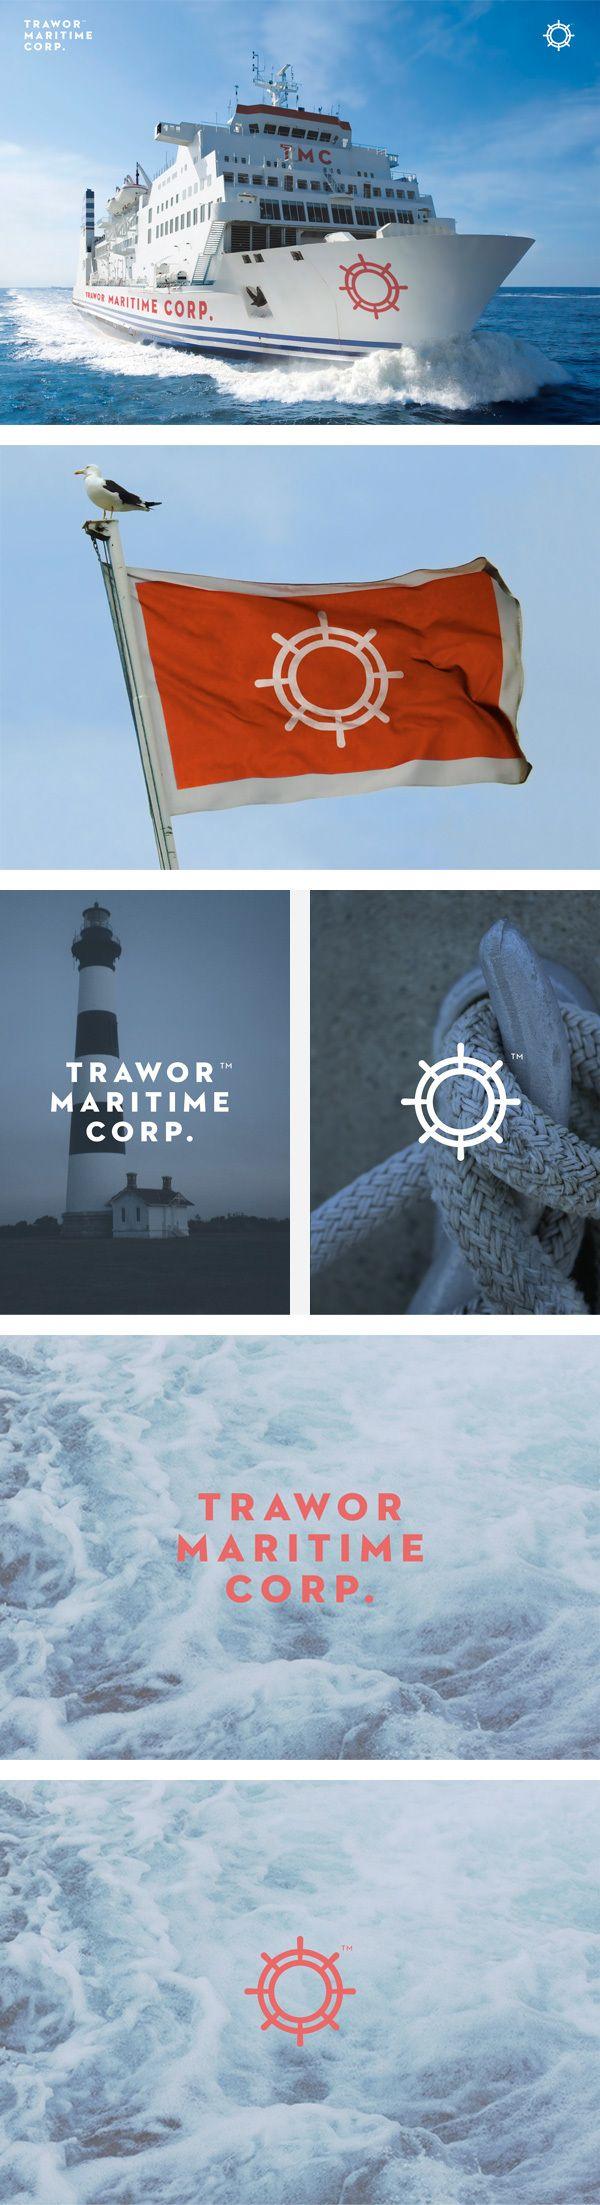 Trawor Maritime Corp. Identity. | #corporate #branding #creative #logo #personalized #identity #design #corporatedesign < repinned by www.BlickeDeeler.de | Visit our website www.blickedeeler.de/leistungen/corporate-design/logo-gestaltung